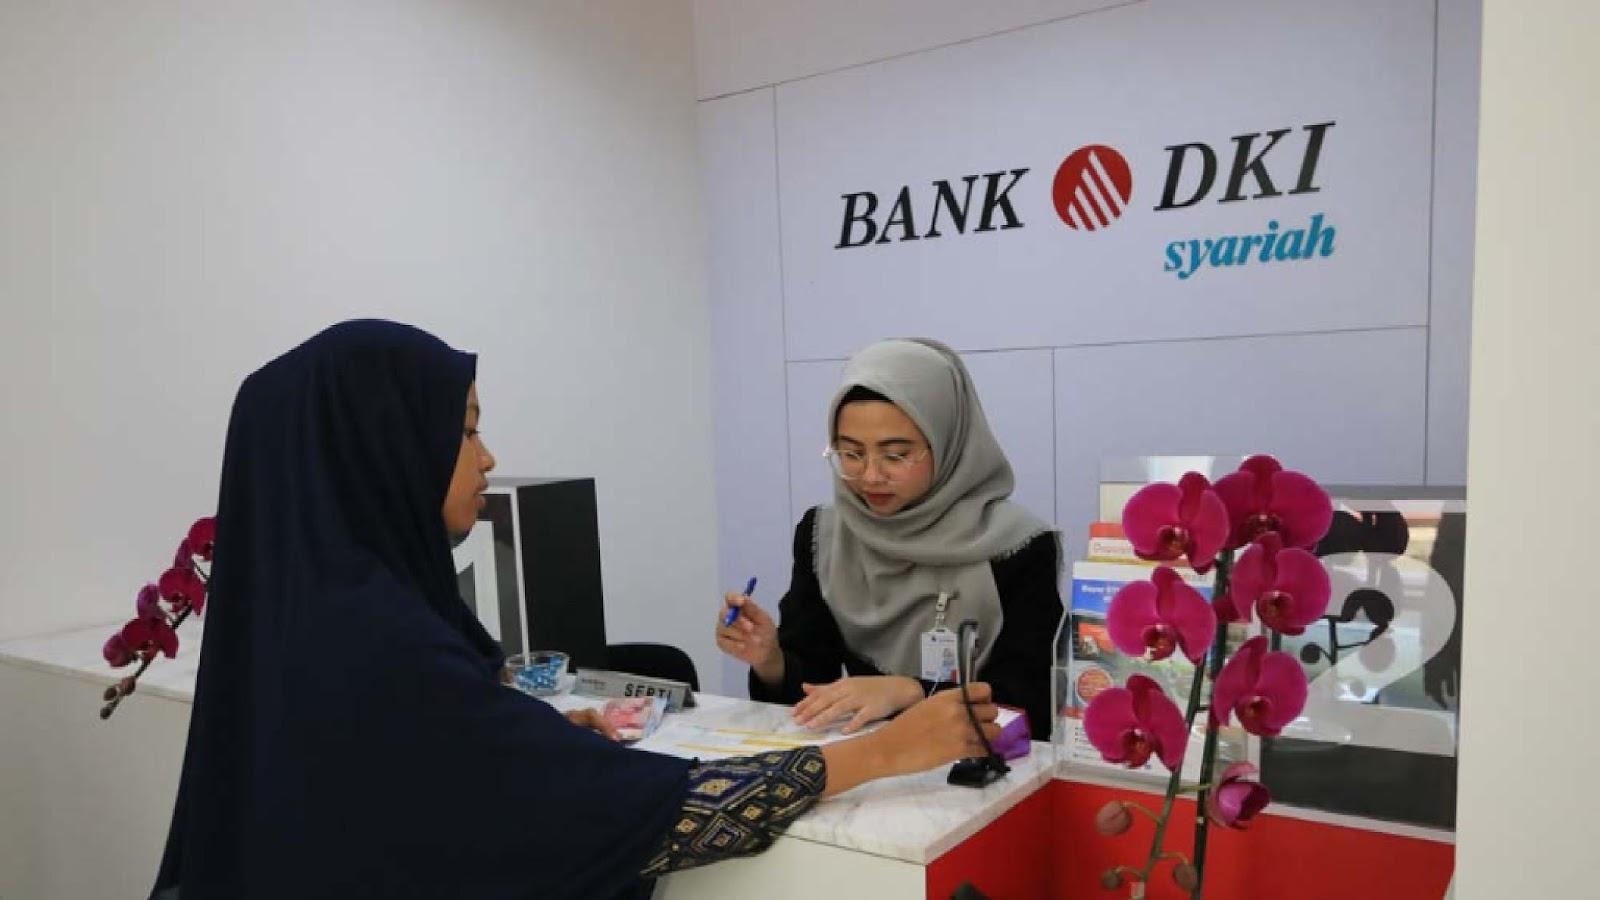 Syarat Membuka Rekening Baru Bank DKI